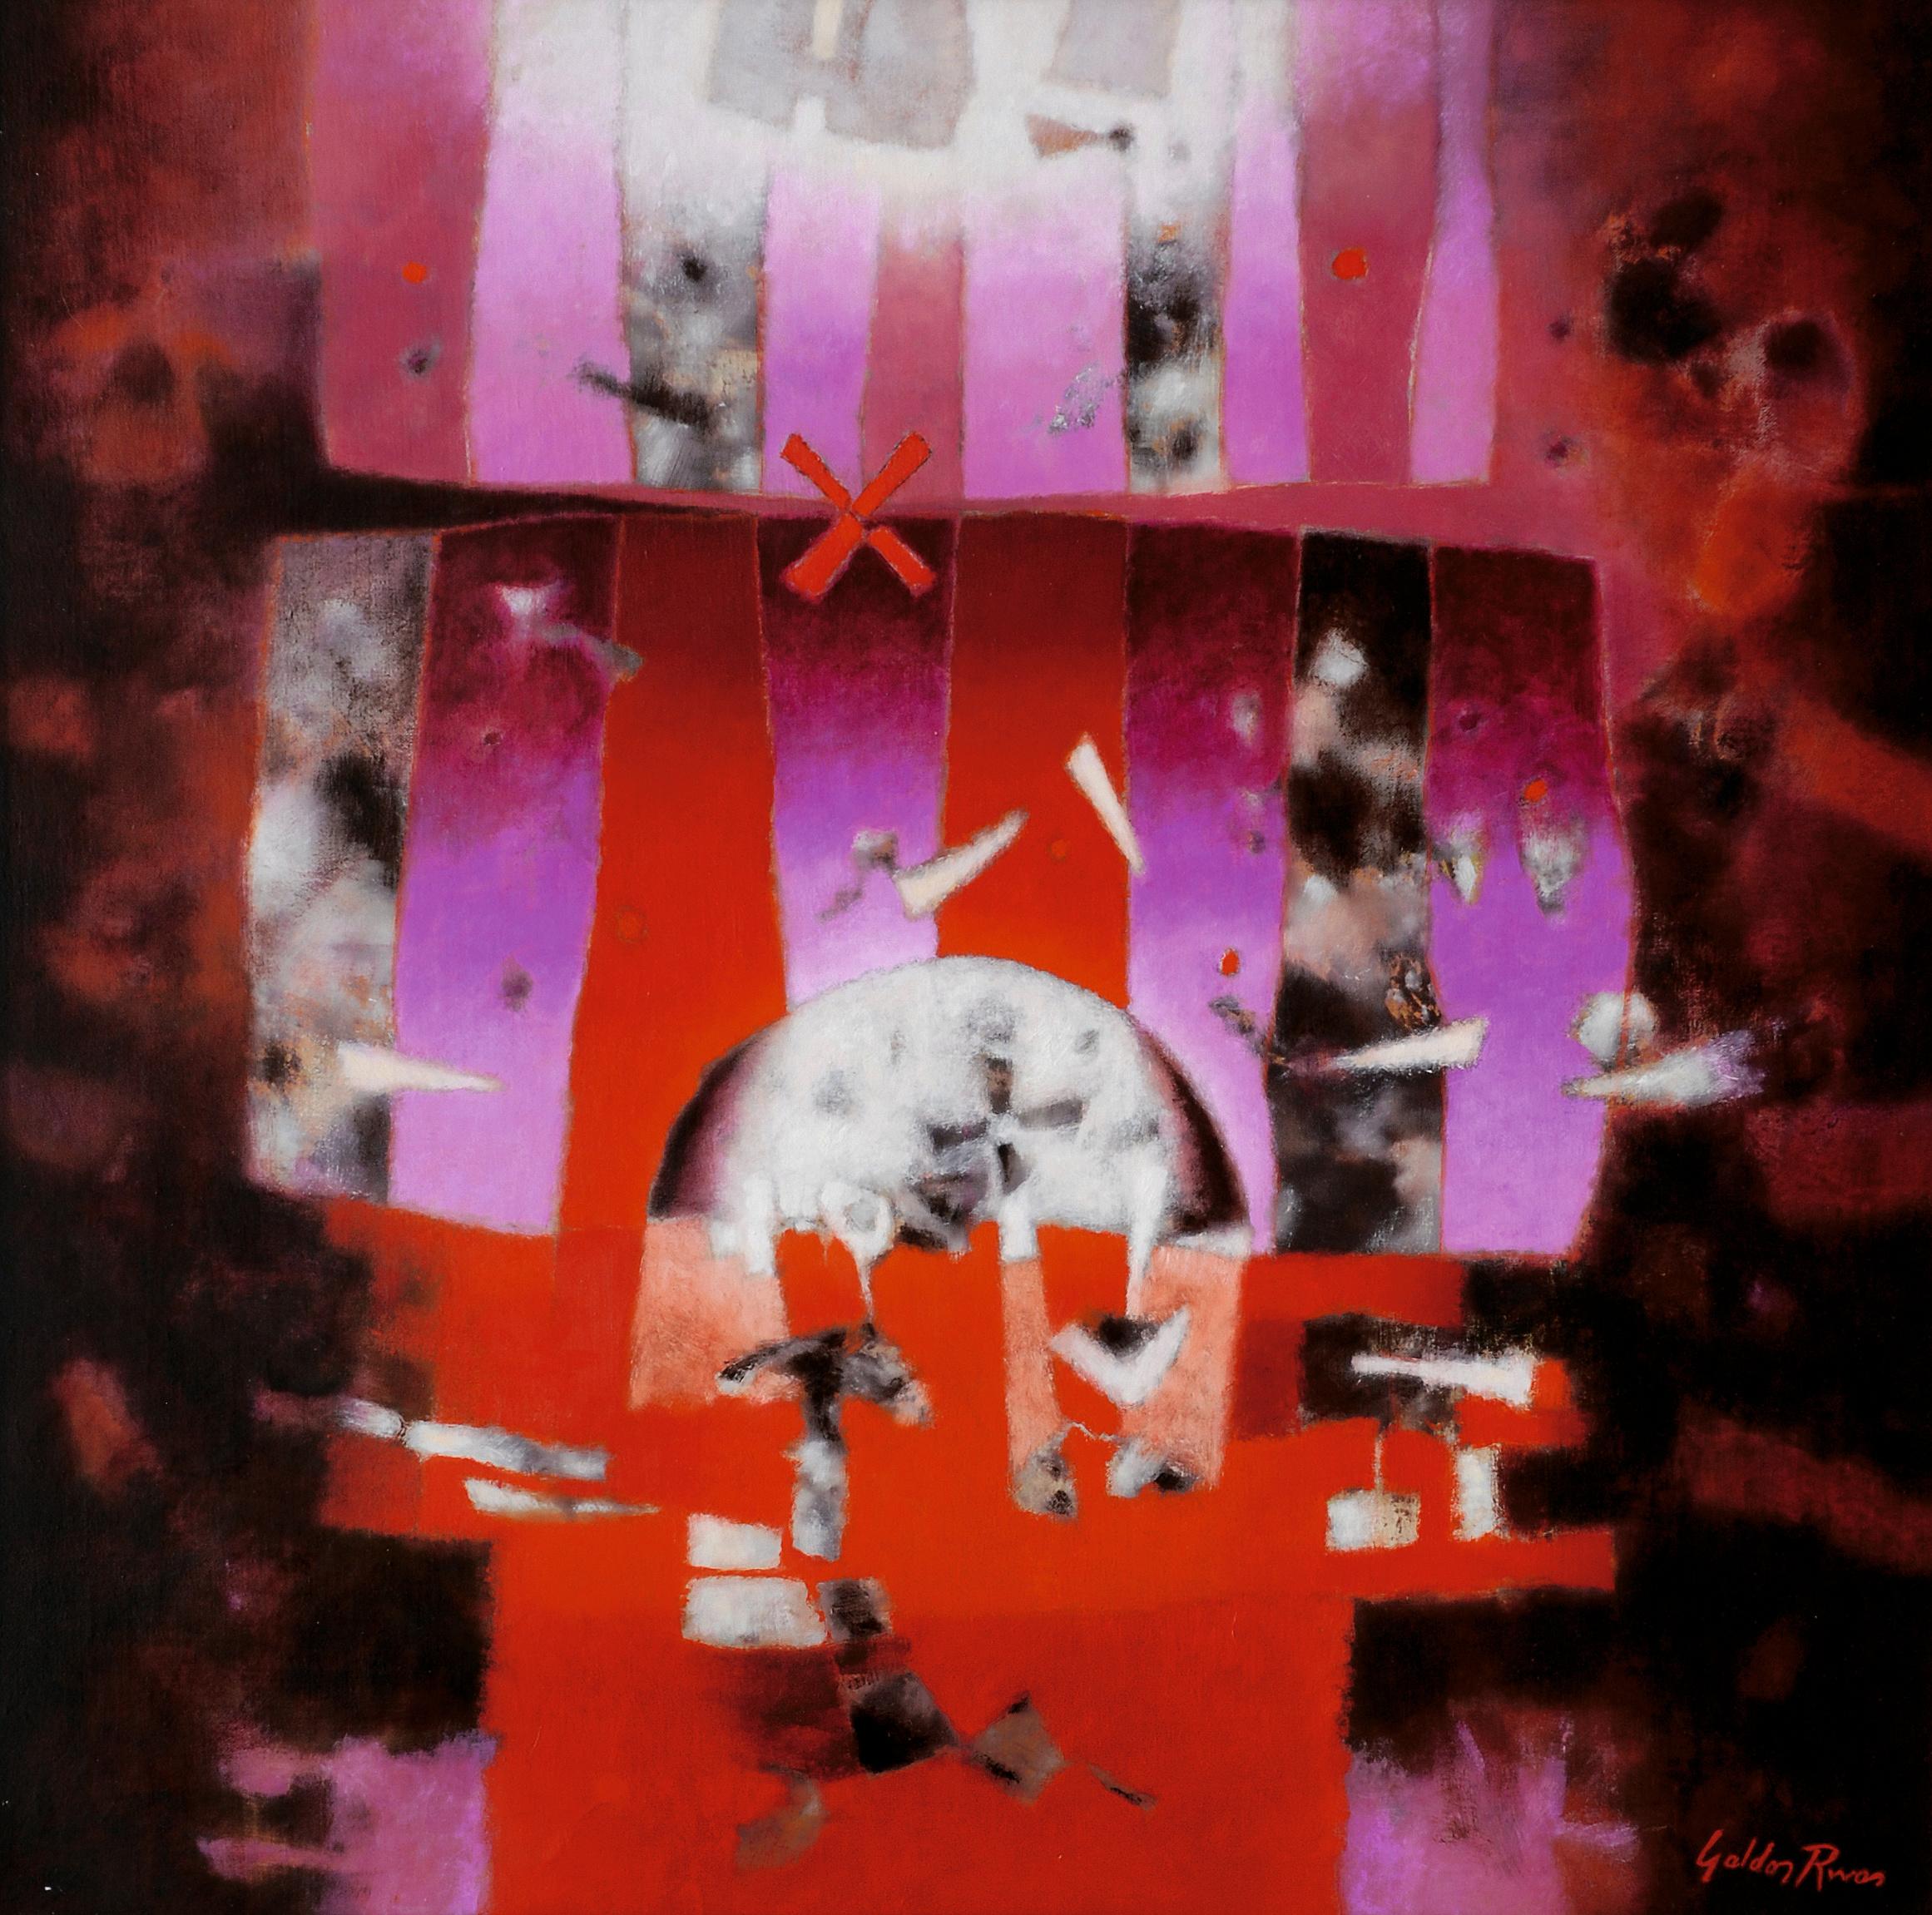 2006_Ventana_a_la_fantasía_A_81_x_81.jpg